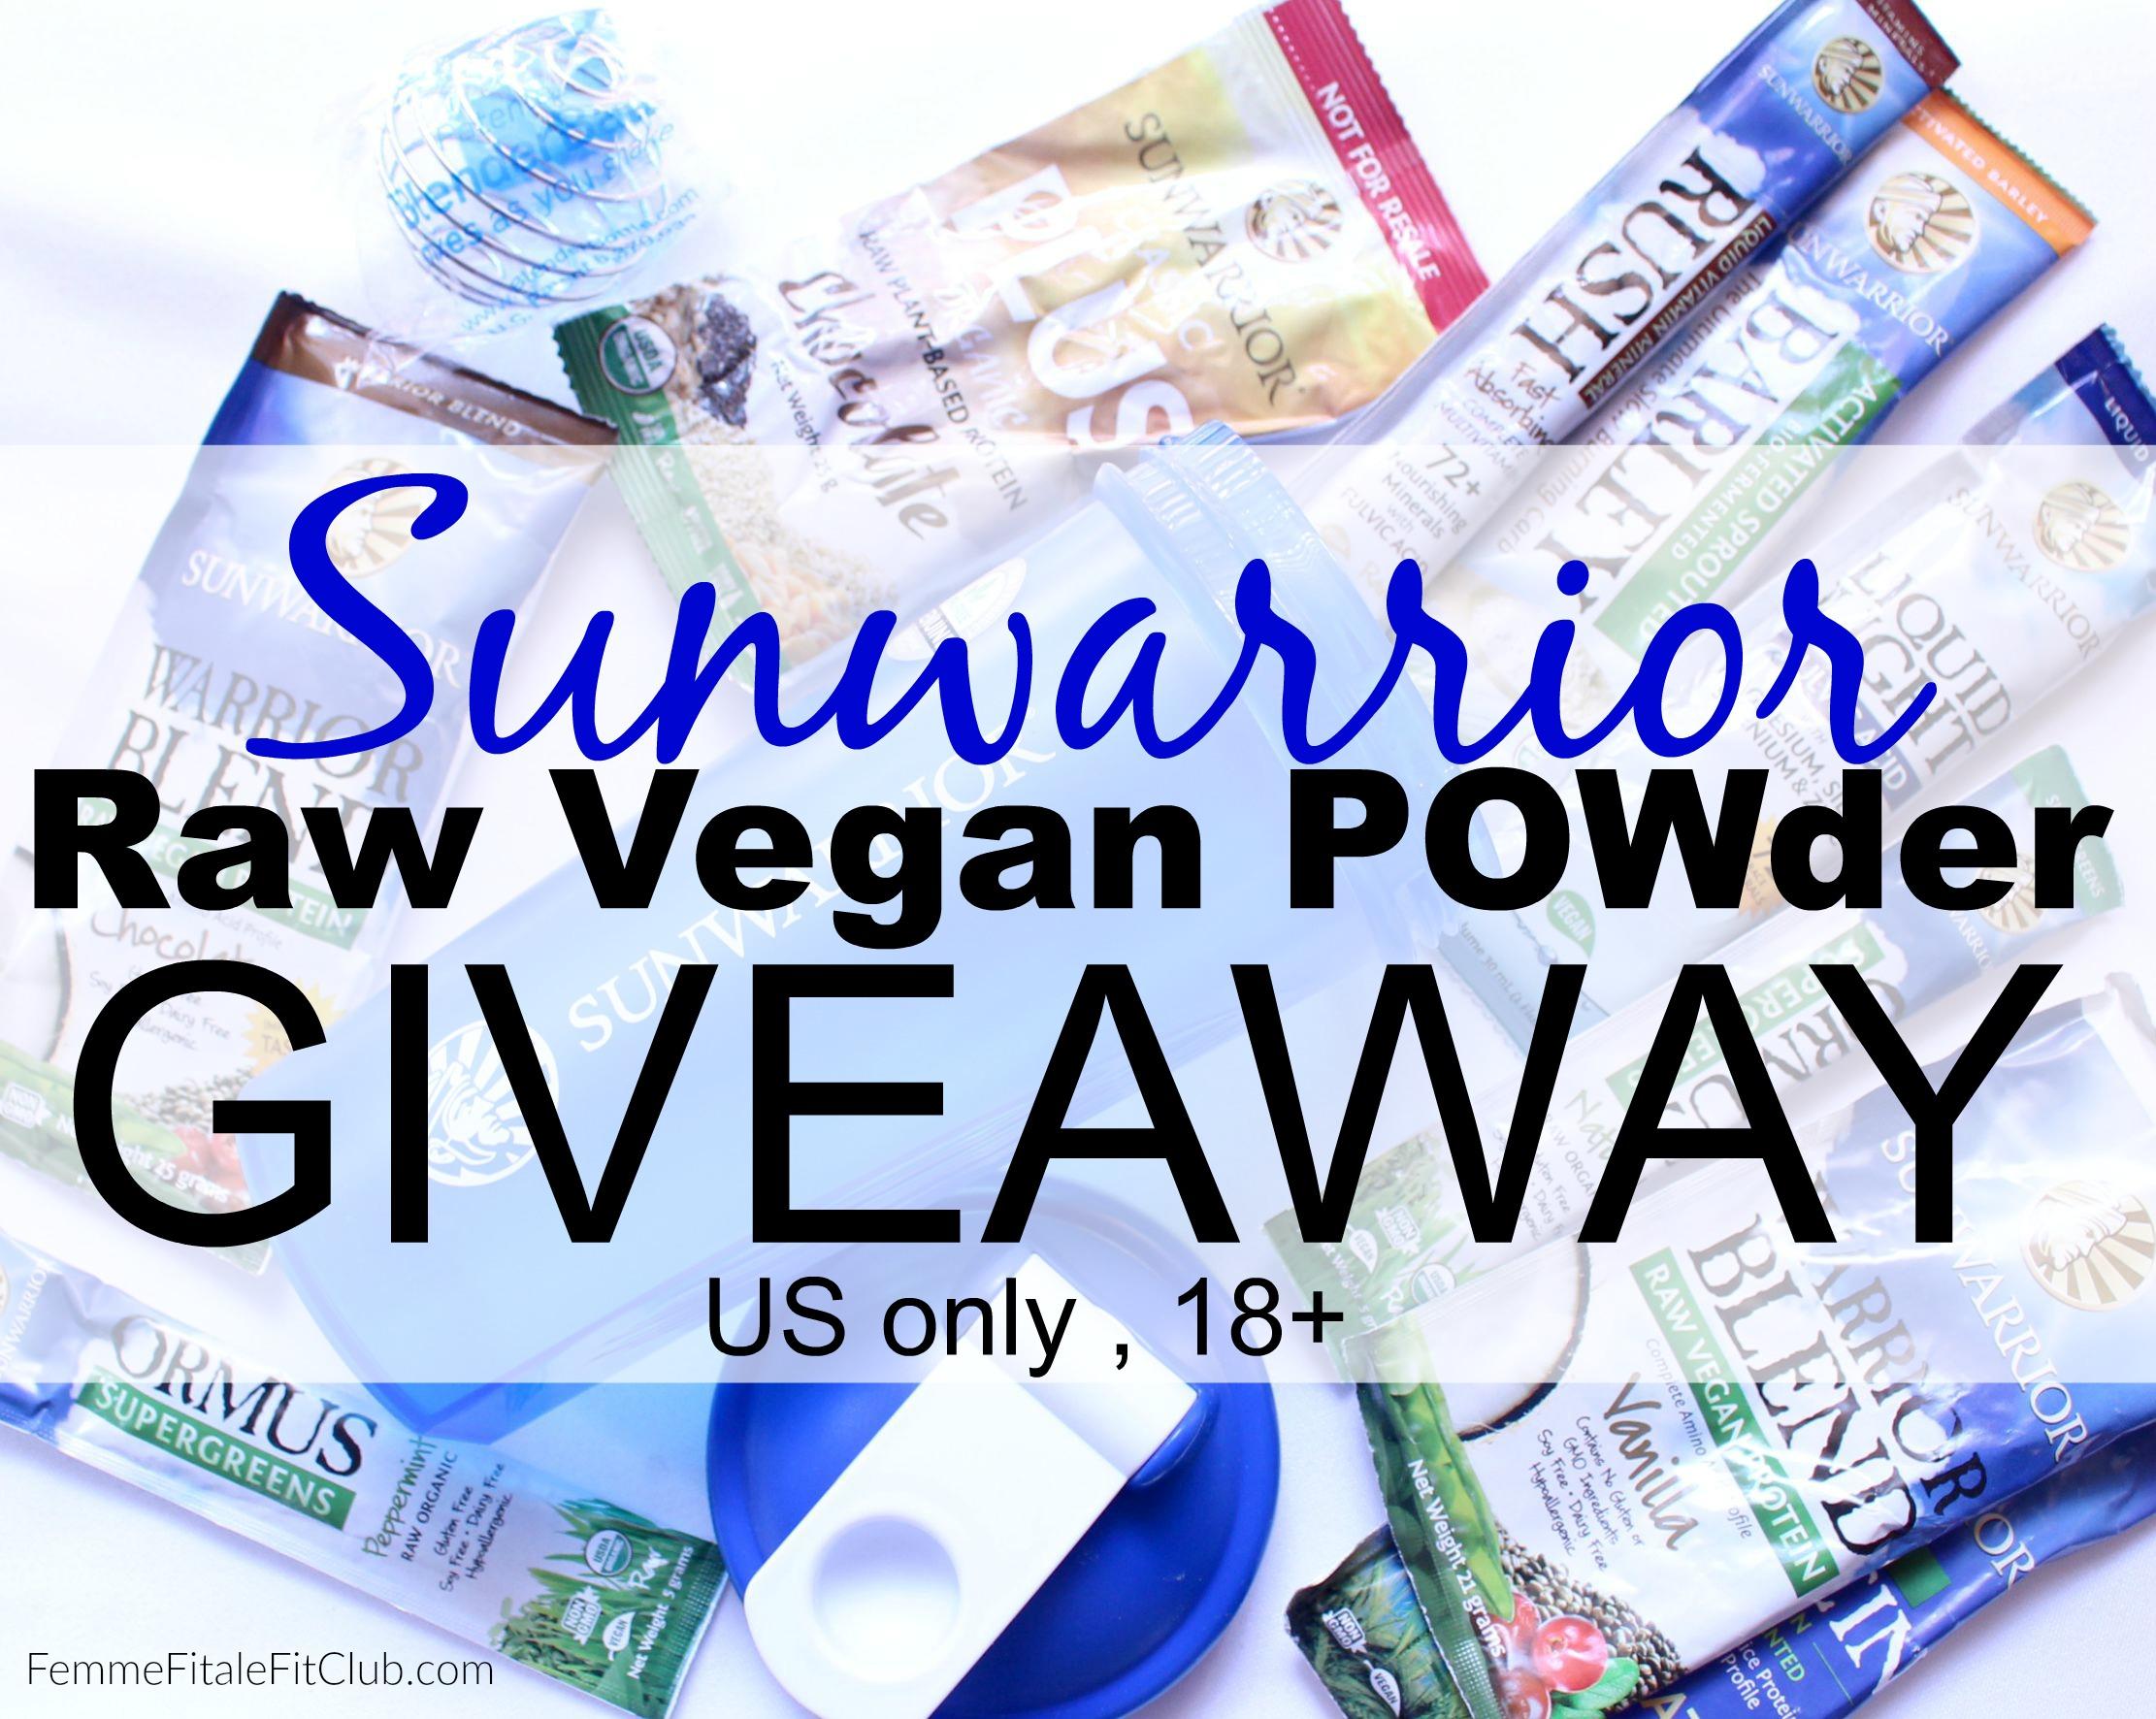 Sunwarrior Raw Vega Powder Giveaway